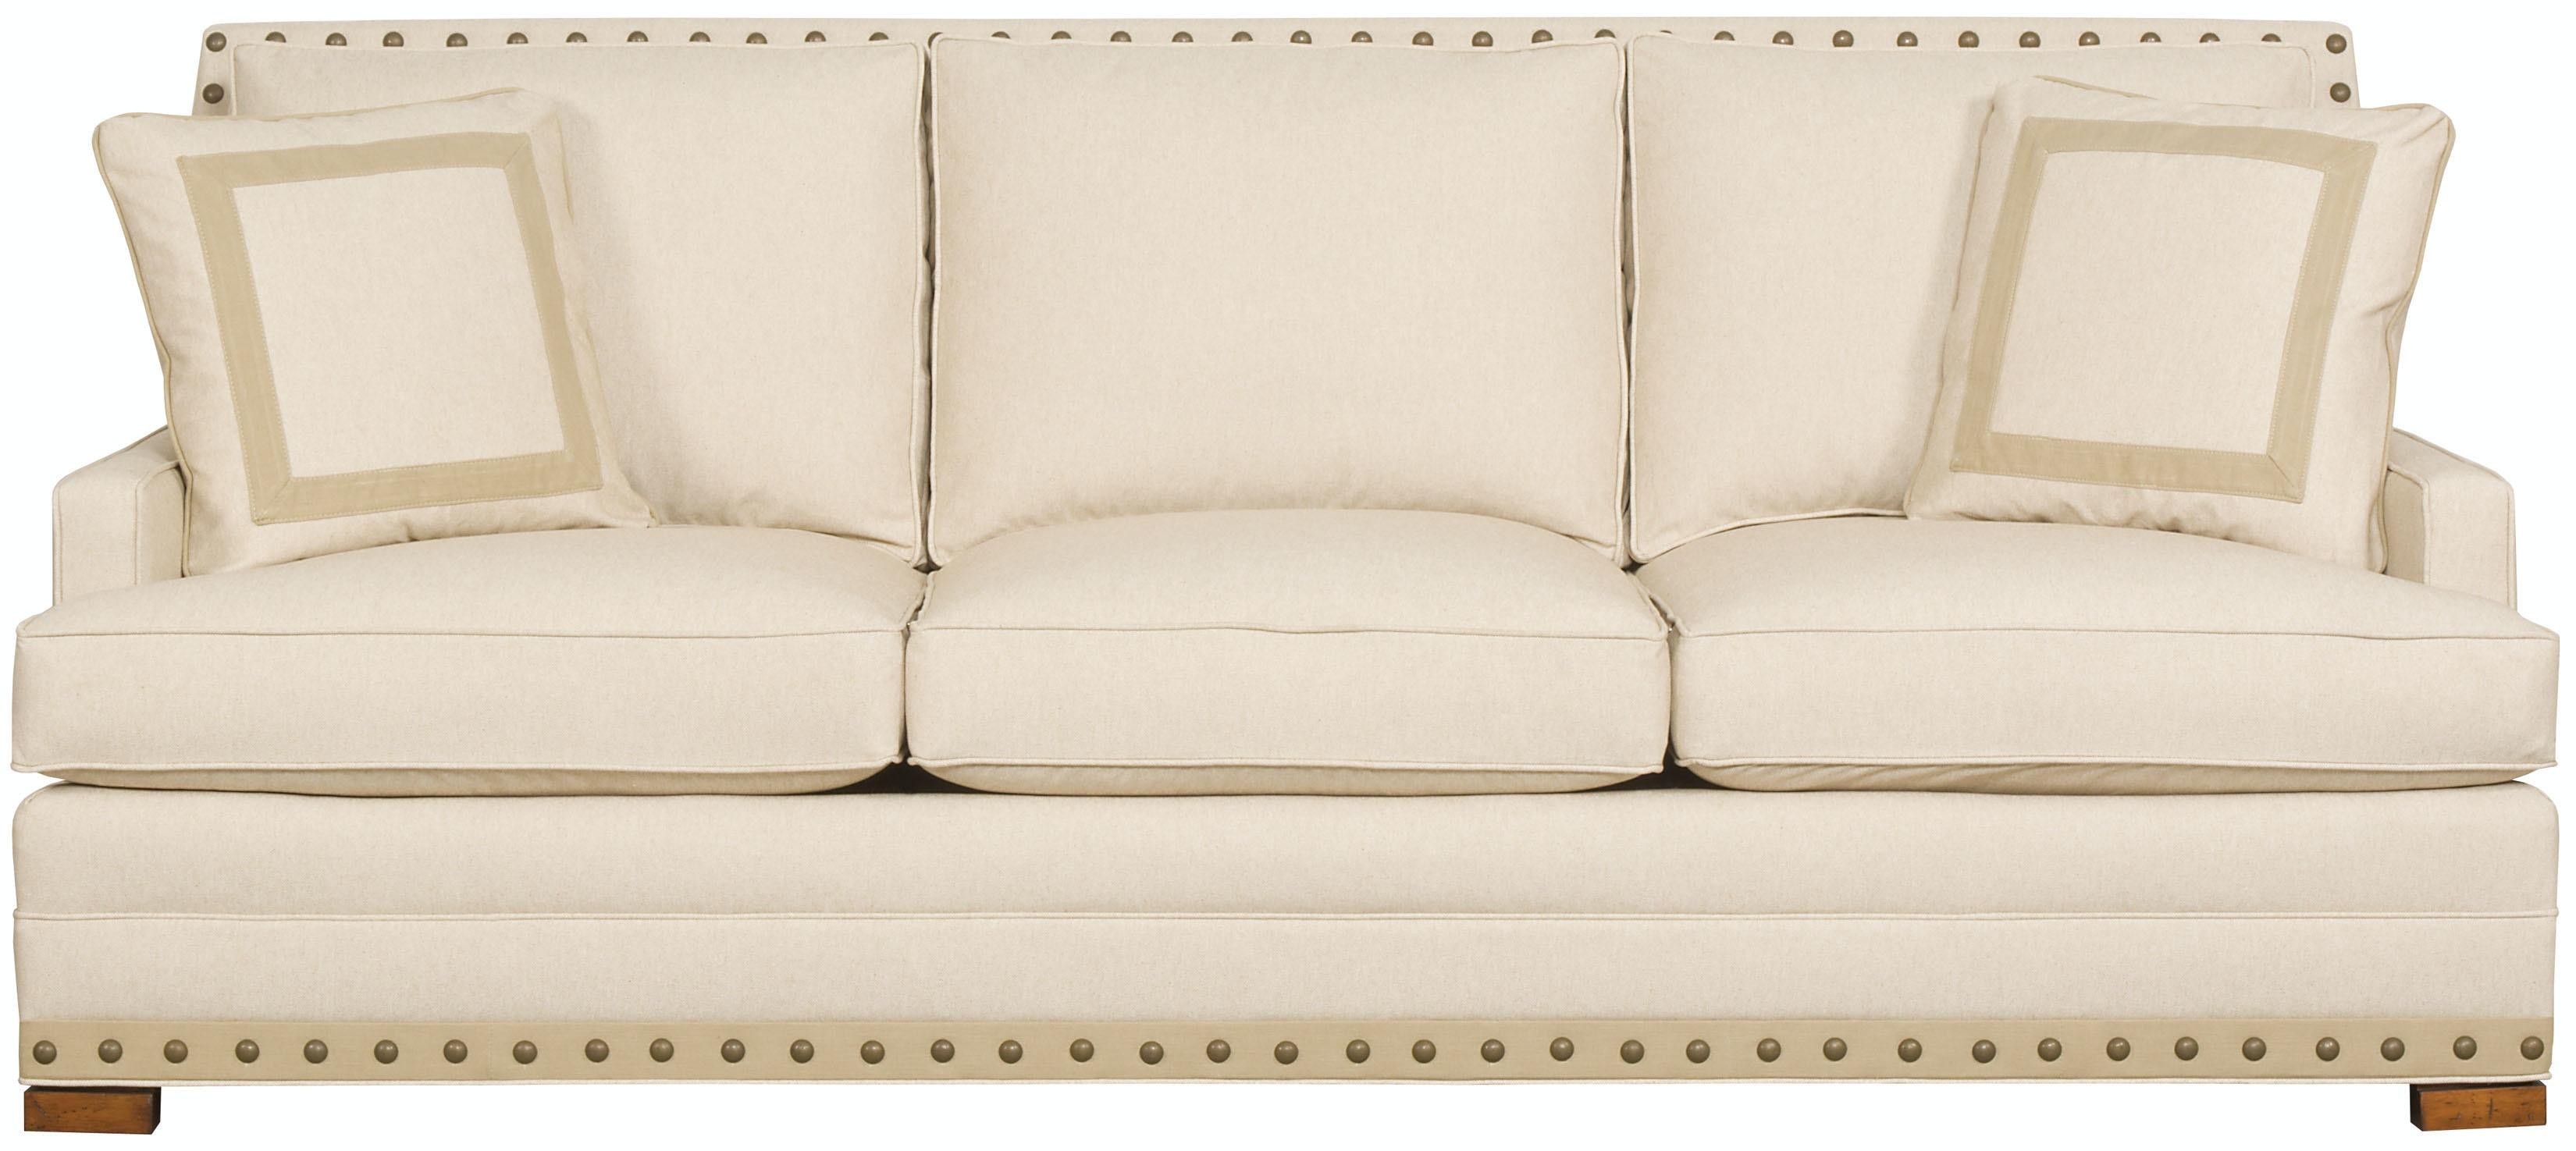 Vanguard Riverside Sofa 604 S - Hamilton sofa and Leather Gallery